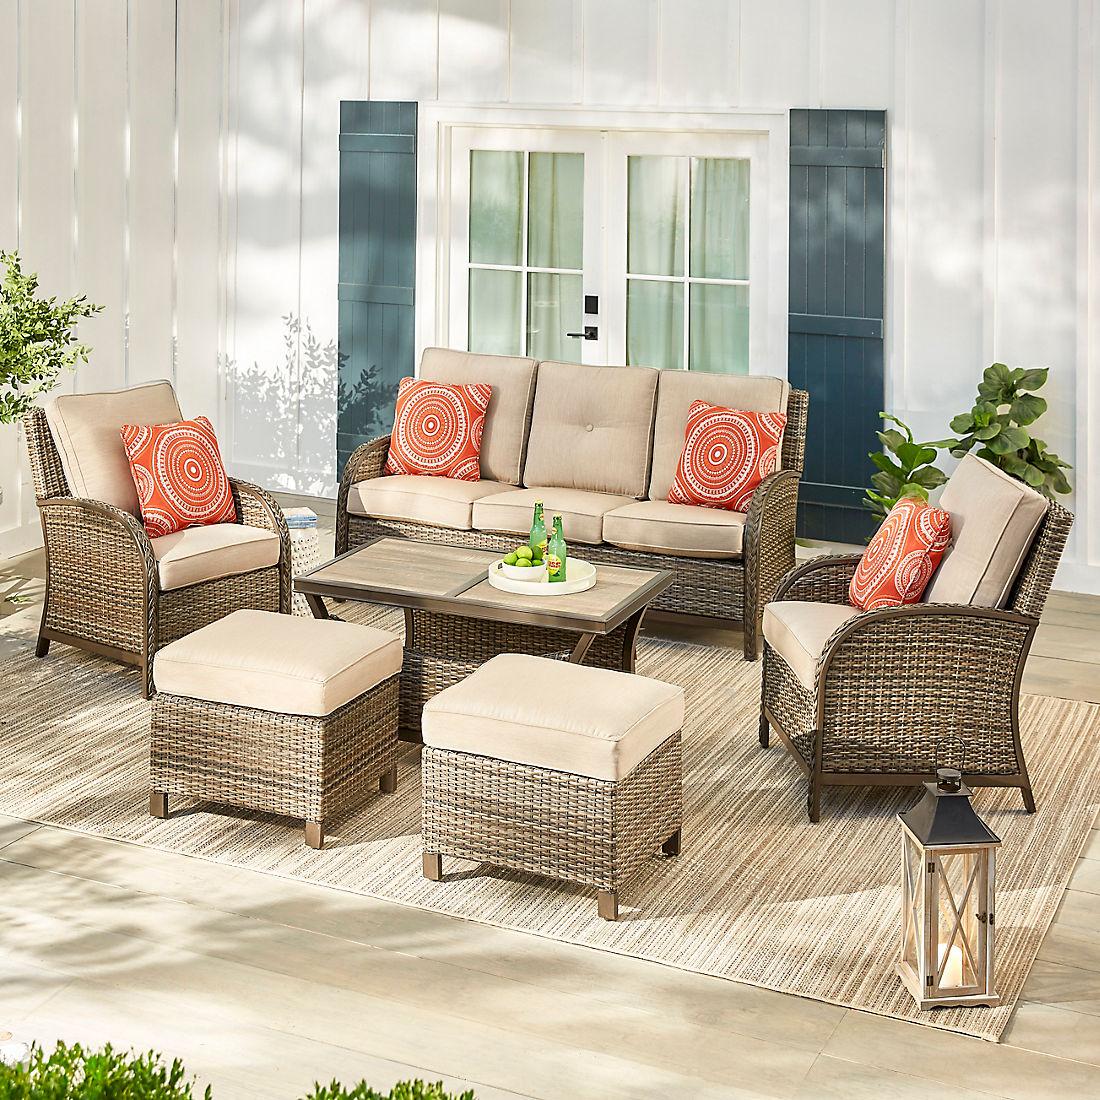 Awesome Berkley Jensen Casco Bay 6 Pc Deep Seating Set Brown Theyellowbook Wood Chair Design Ideas Theyellowbookinfo